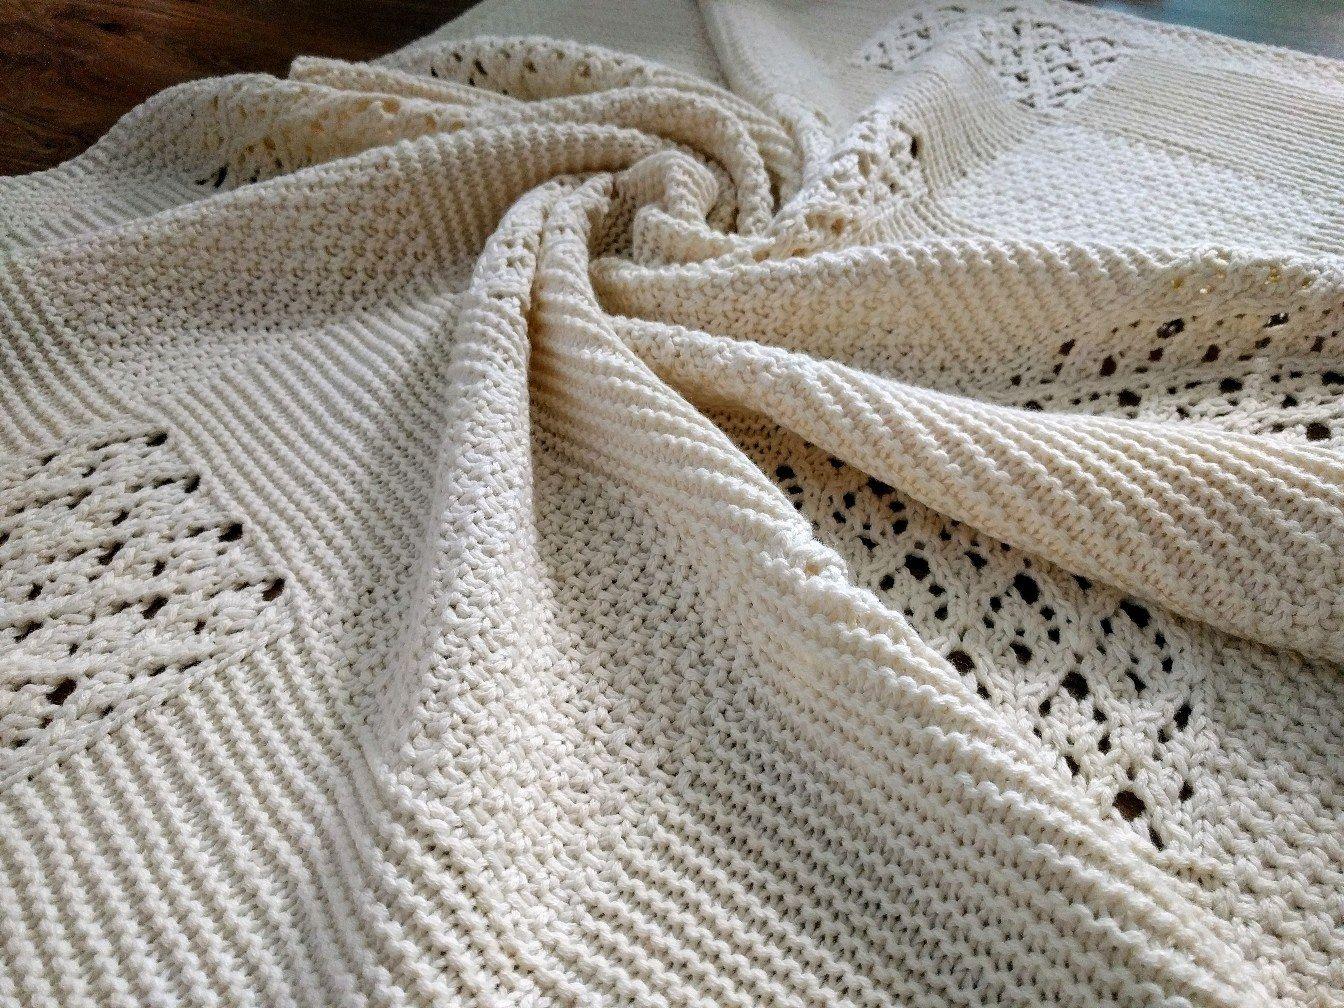 Children's blanket with knitting needles ' Plombir', Blankets, Zhukovsky,  Фото №1